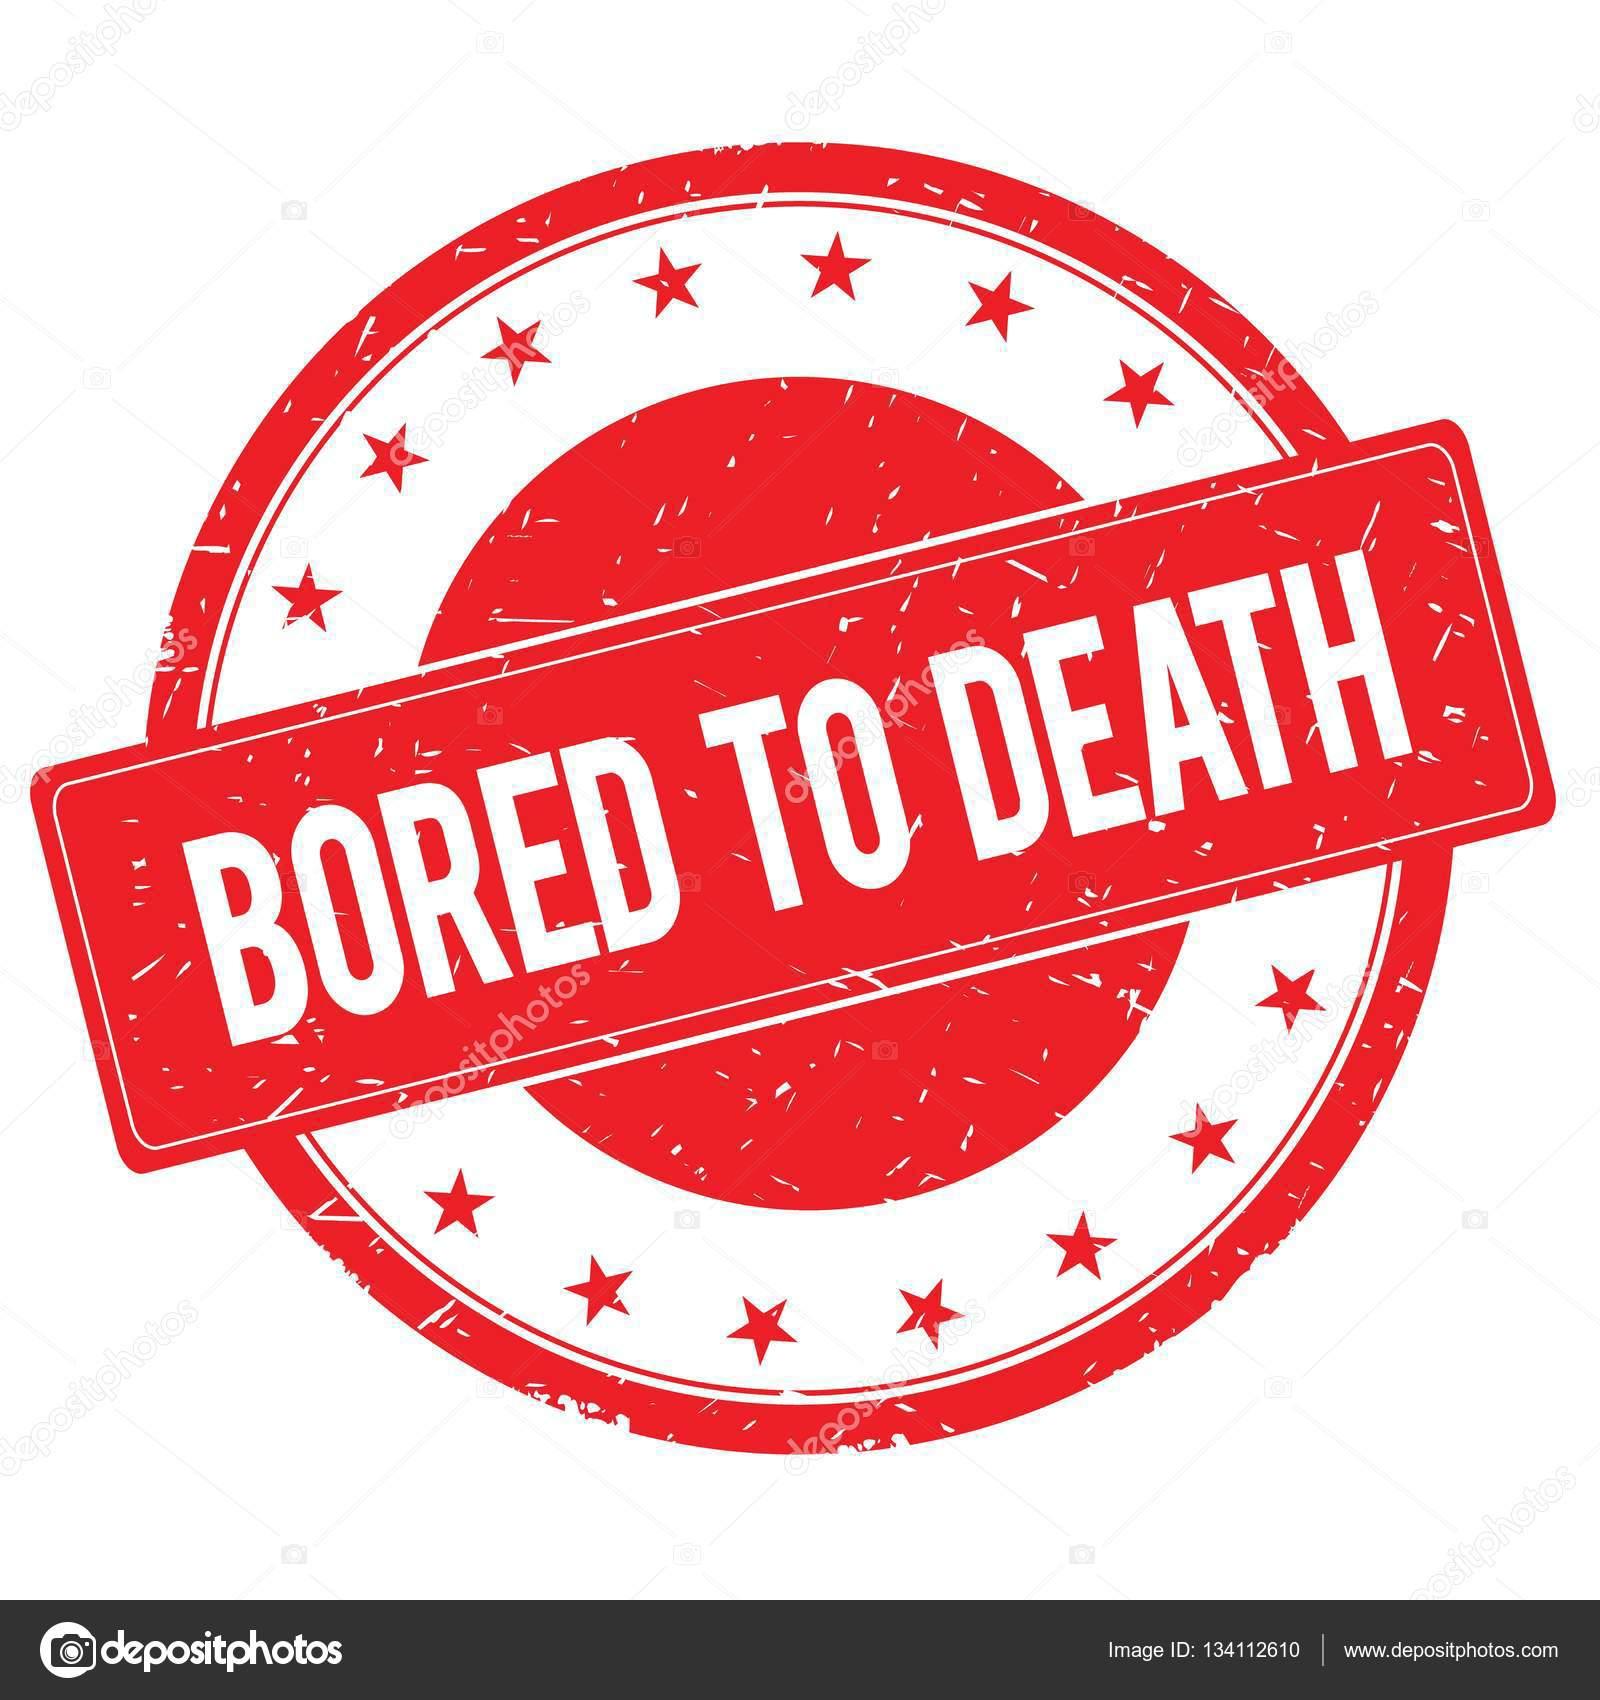 Bored To Death Stempel Zeichen Rot Stockfoto Ionutparvu 134112610